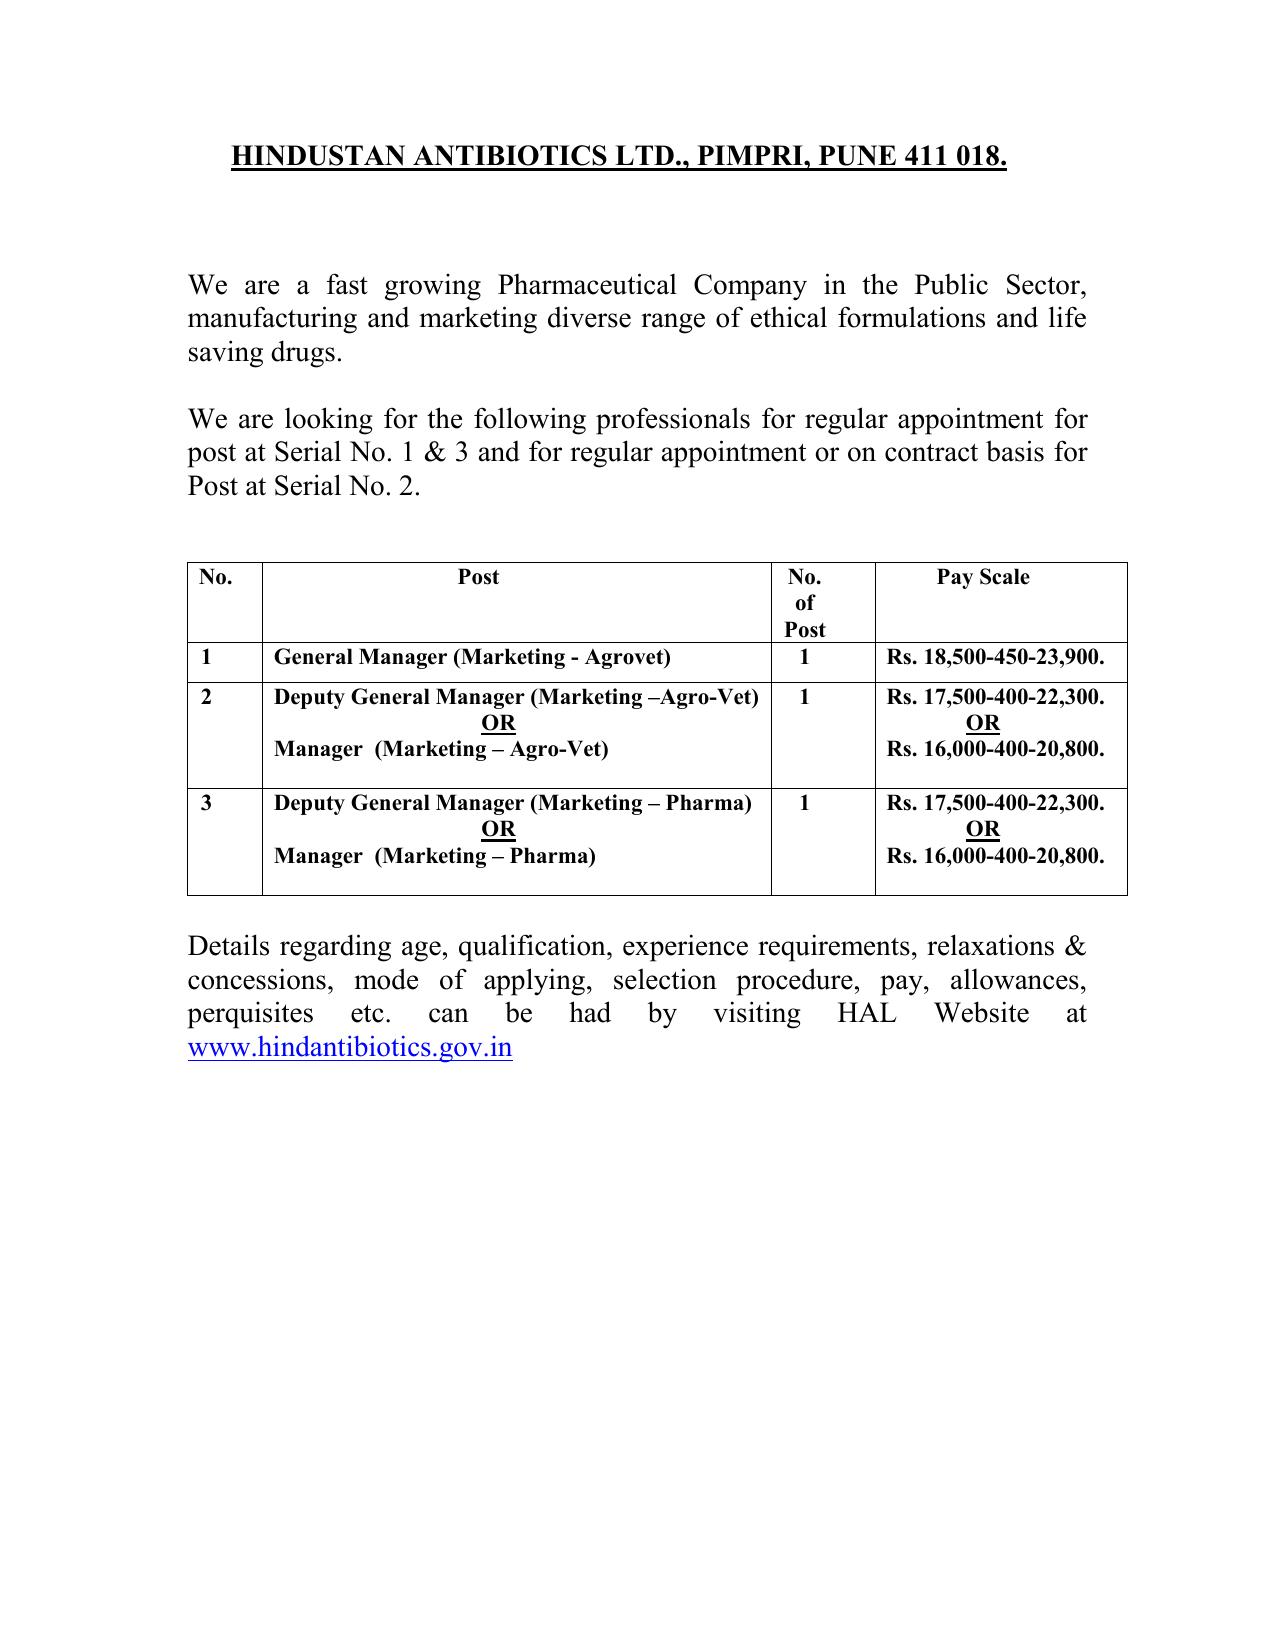 HINDUSTAN ANTIBIOTICS LTD - Hindustan Antibiotics Limited